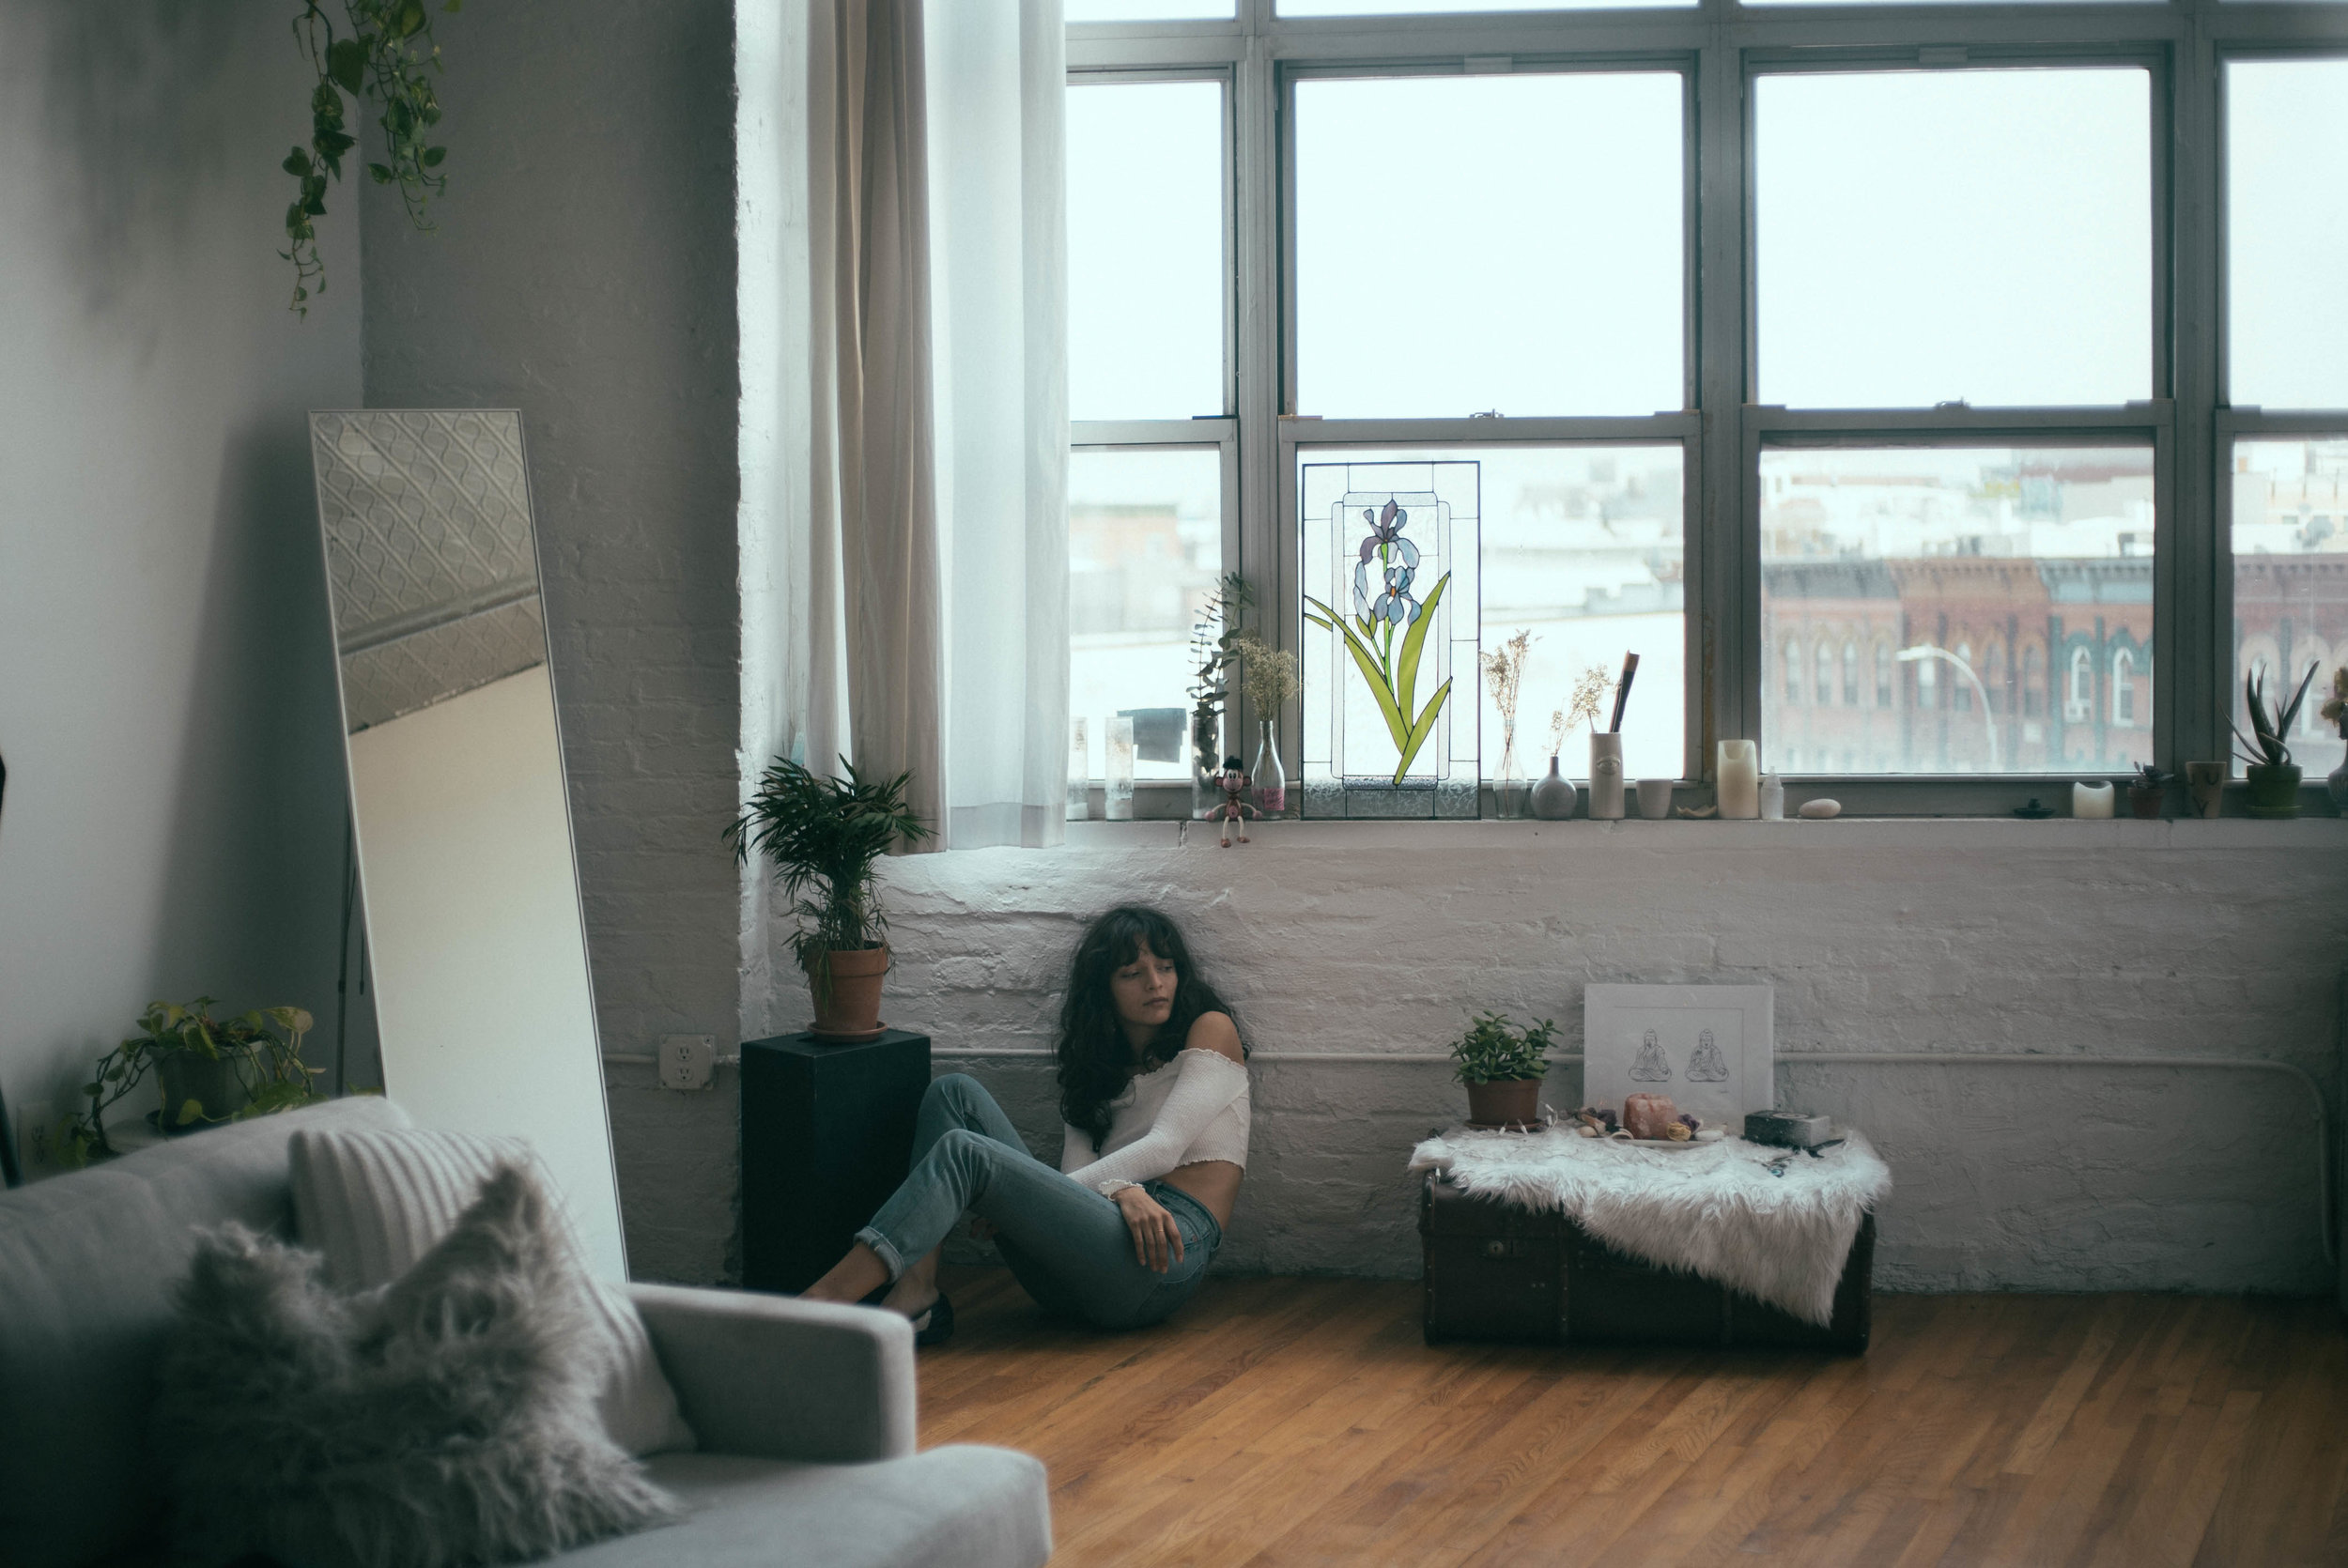 Erica Candice. New York.